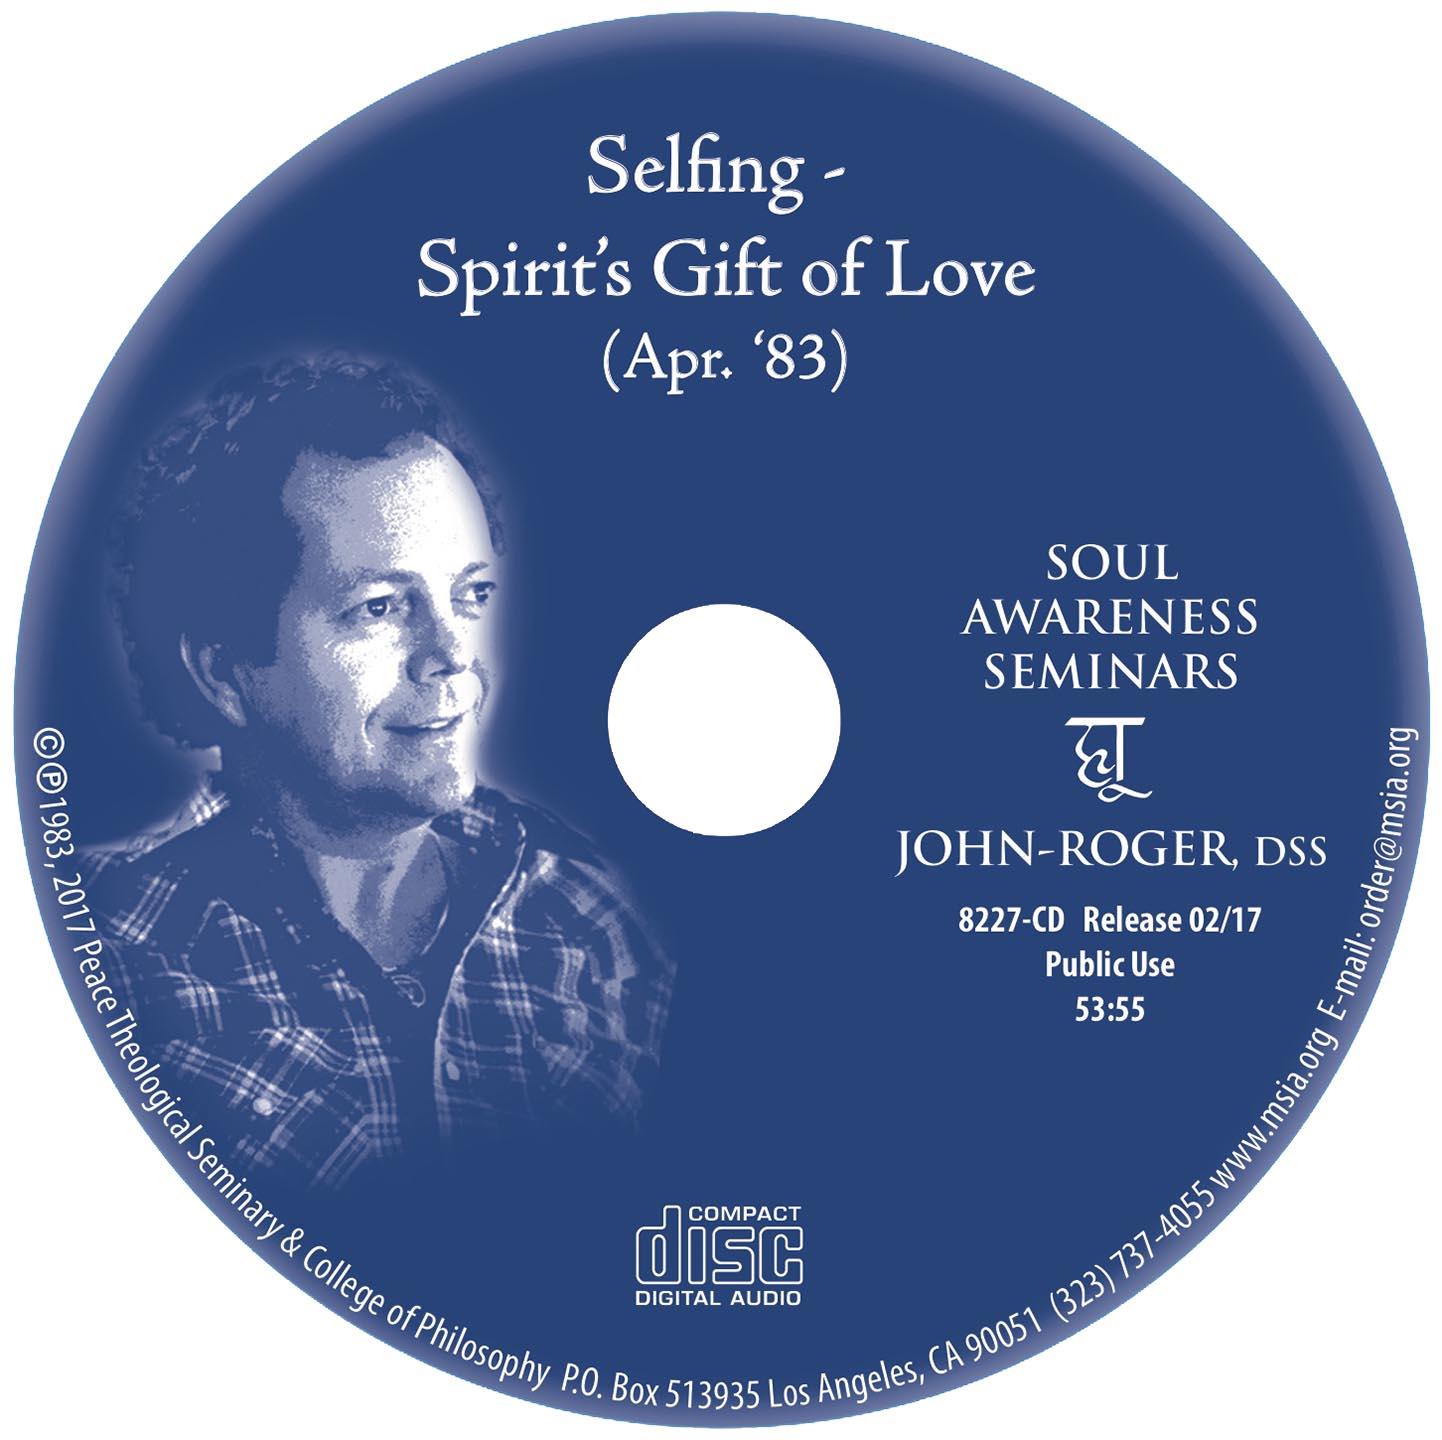 Selfing - Spirit's Gift of Love MP3